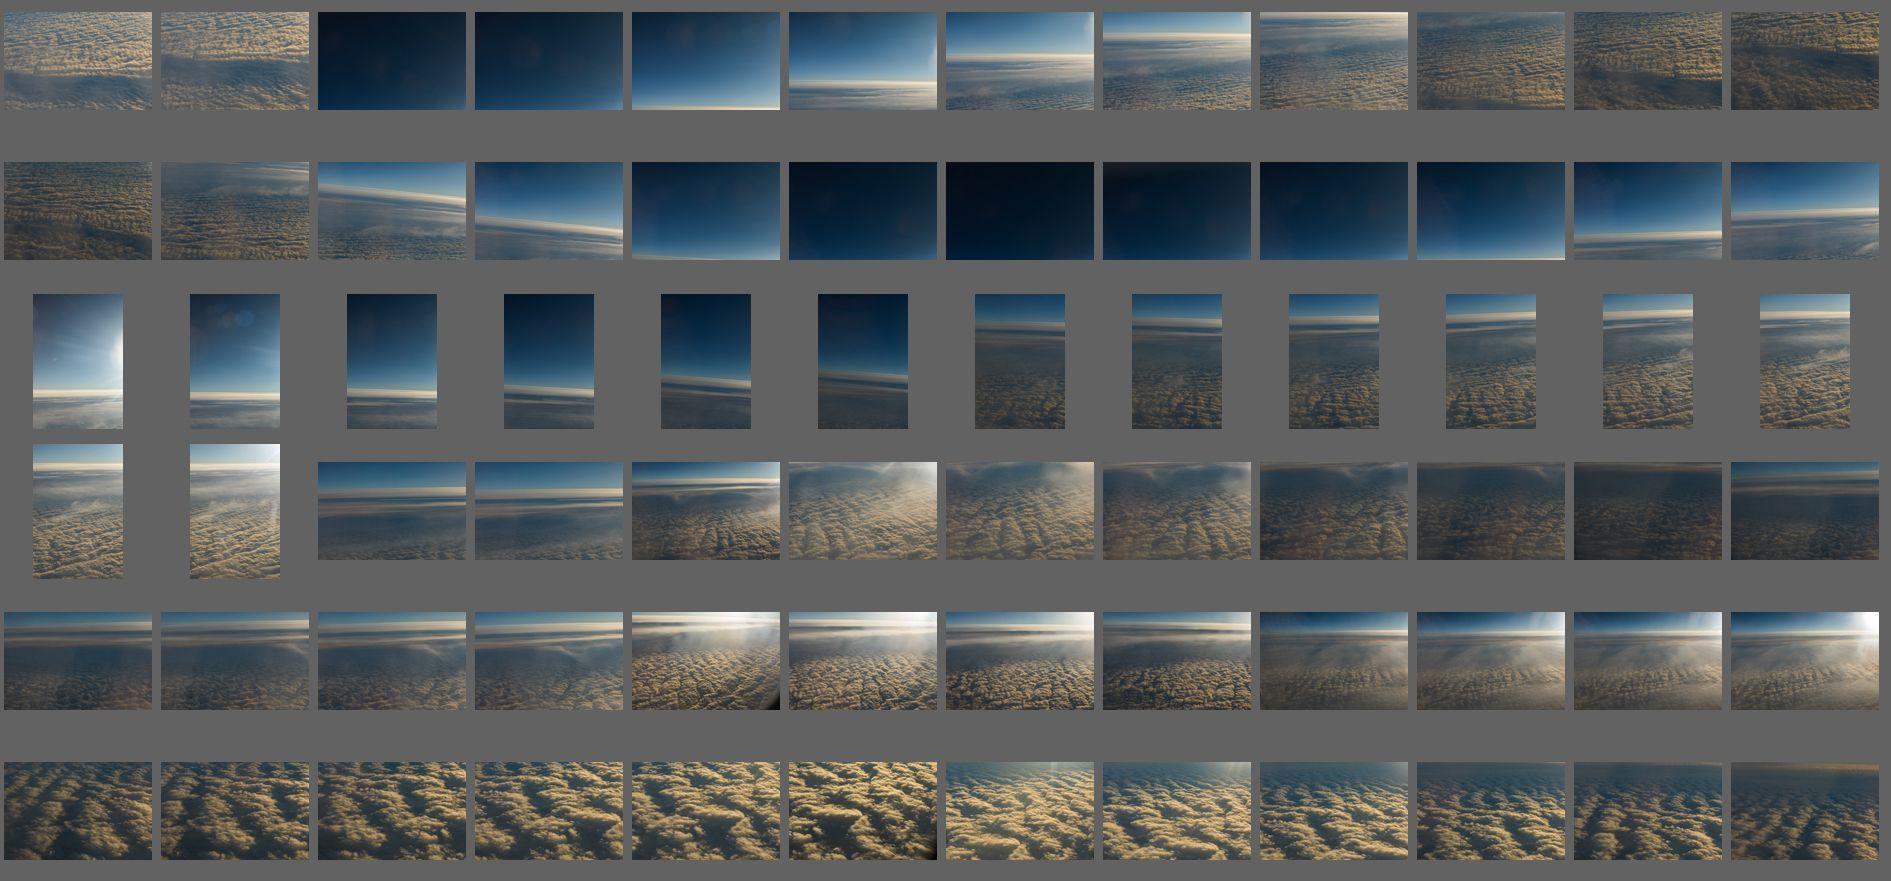 Aerial Clouds vol.7 بک گراند آسمان فتوشاپ پست پروداکشن